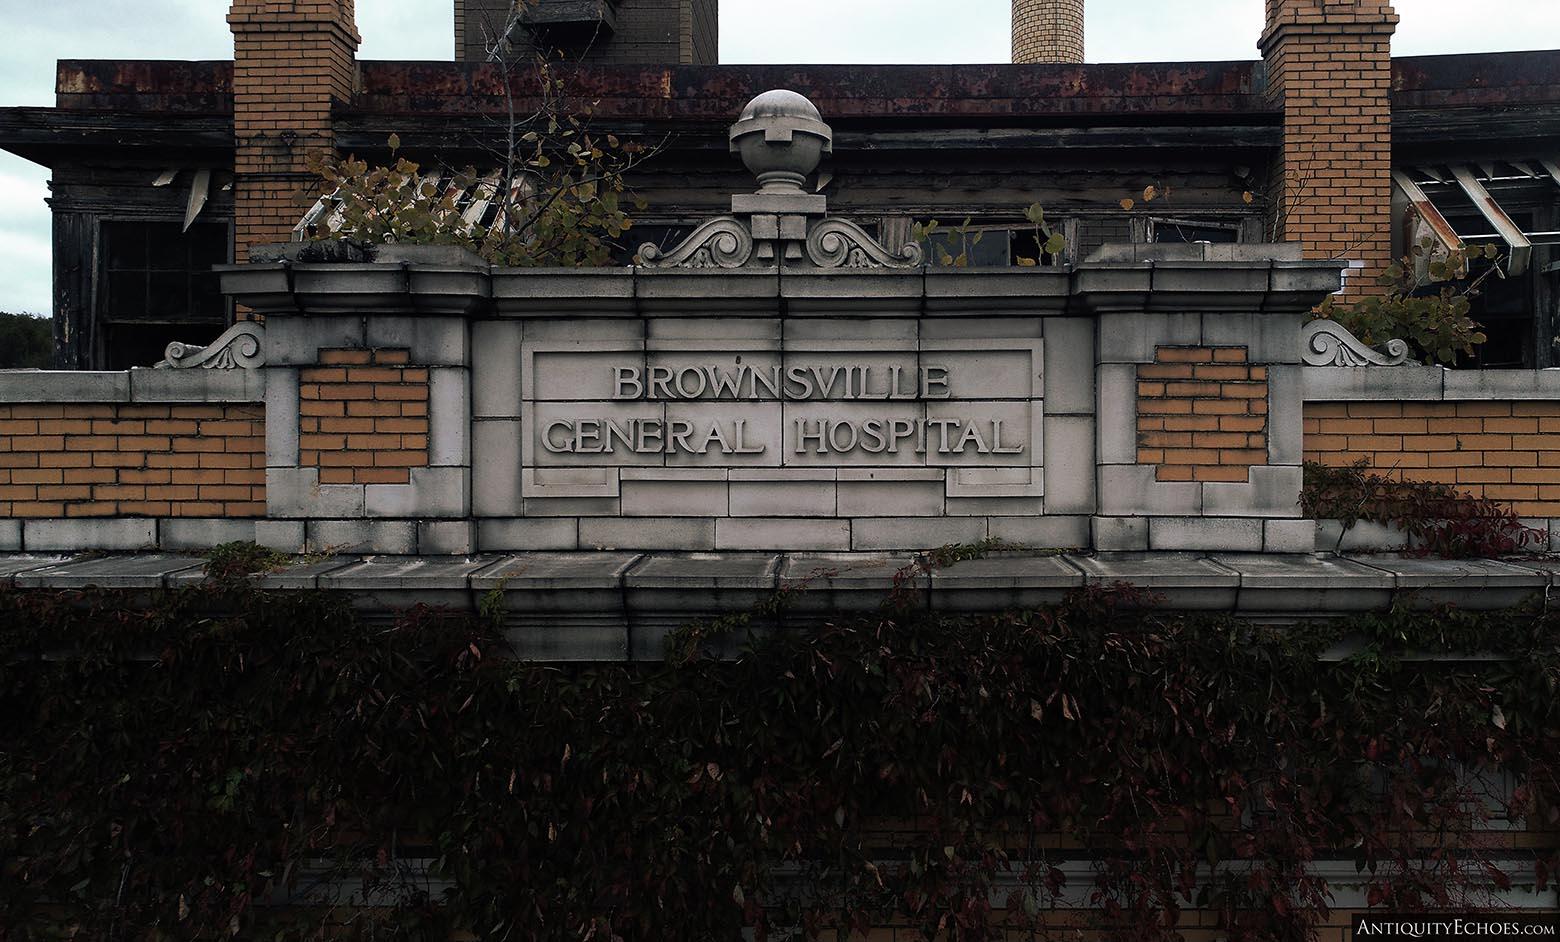 Brownsville General Hospital - Stonework Detail